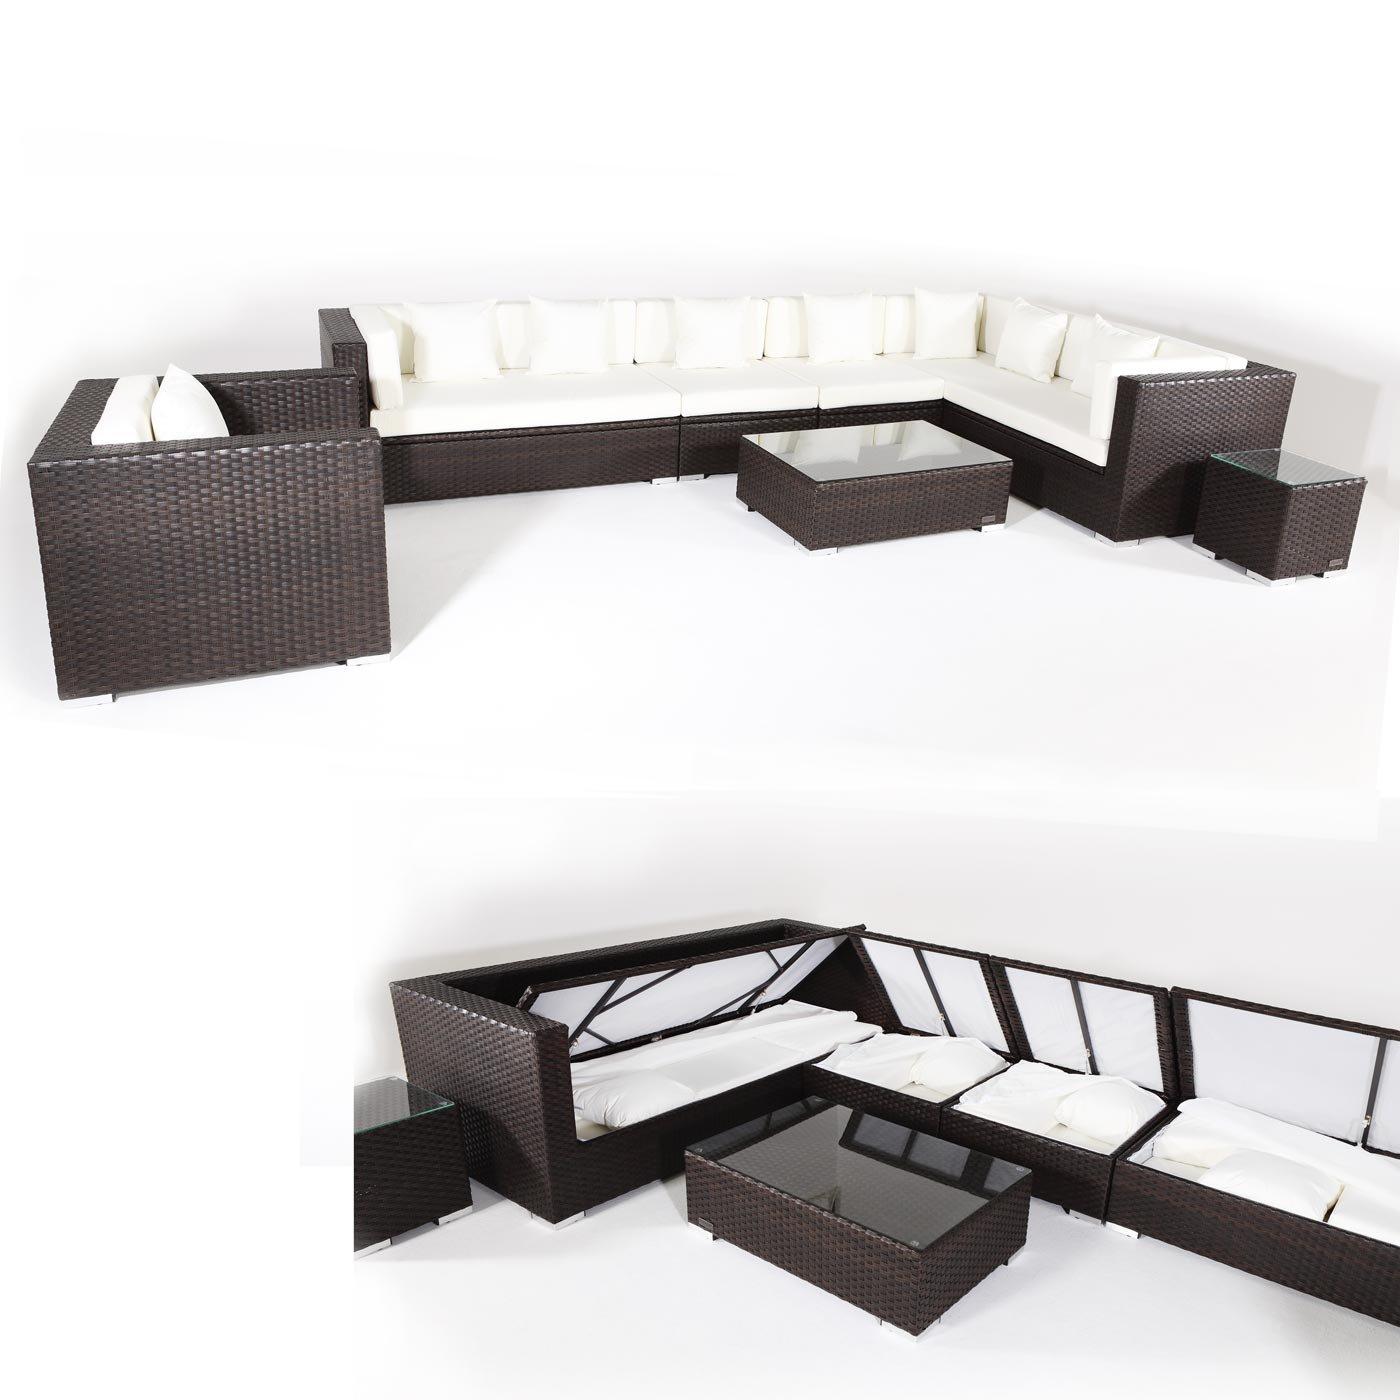 Poly-Rattan Sofa-Garnitur AH003, Lounge-Set Gartengarnitur Sitzgruppe, Kissenboxfunktion ~ braun